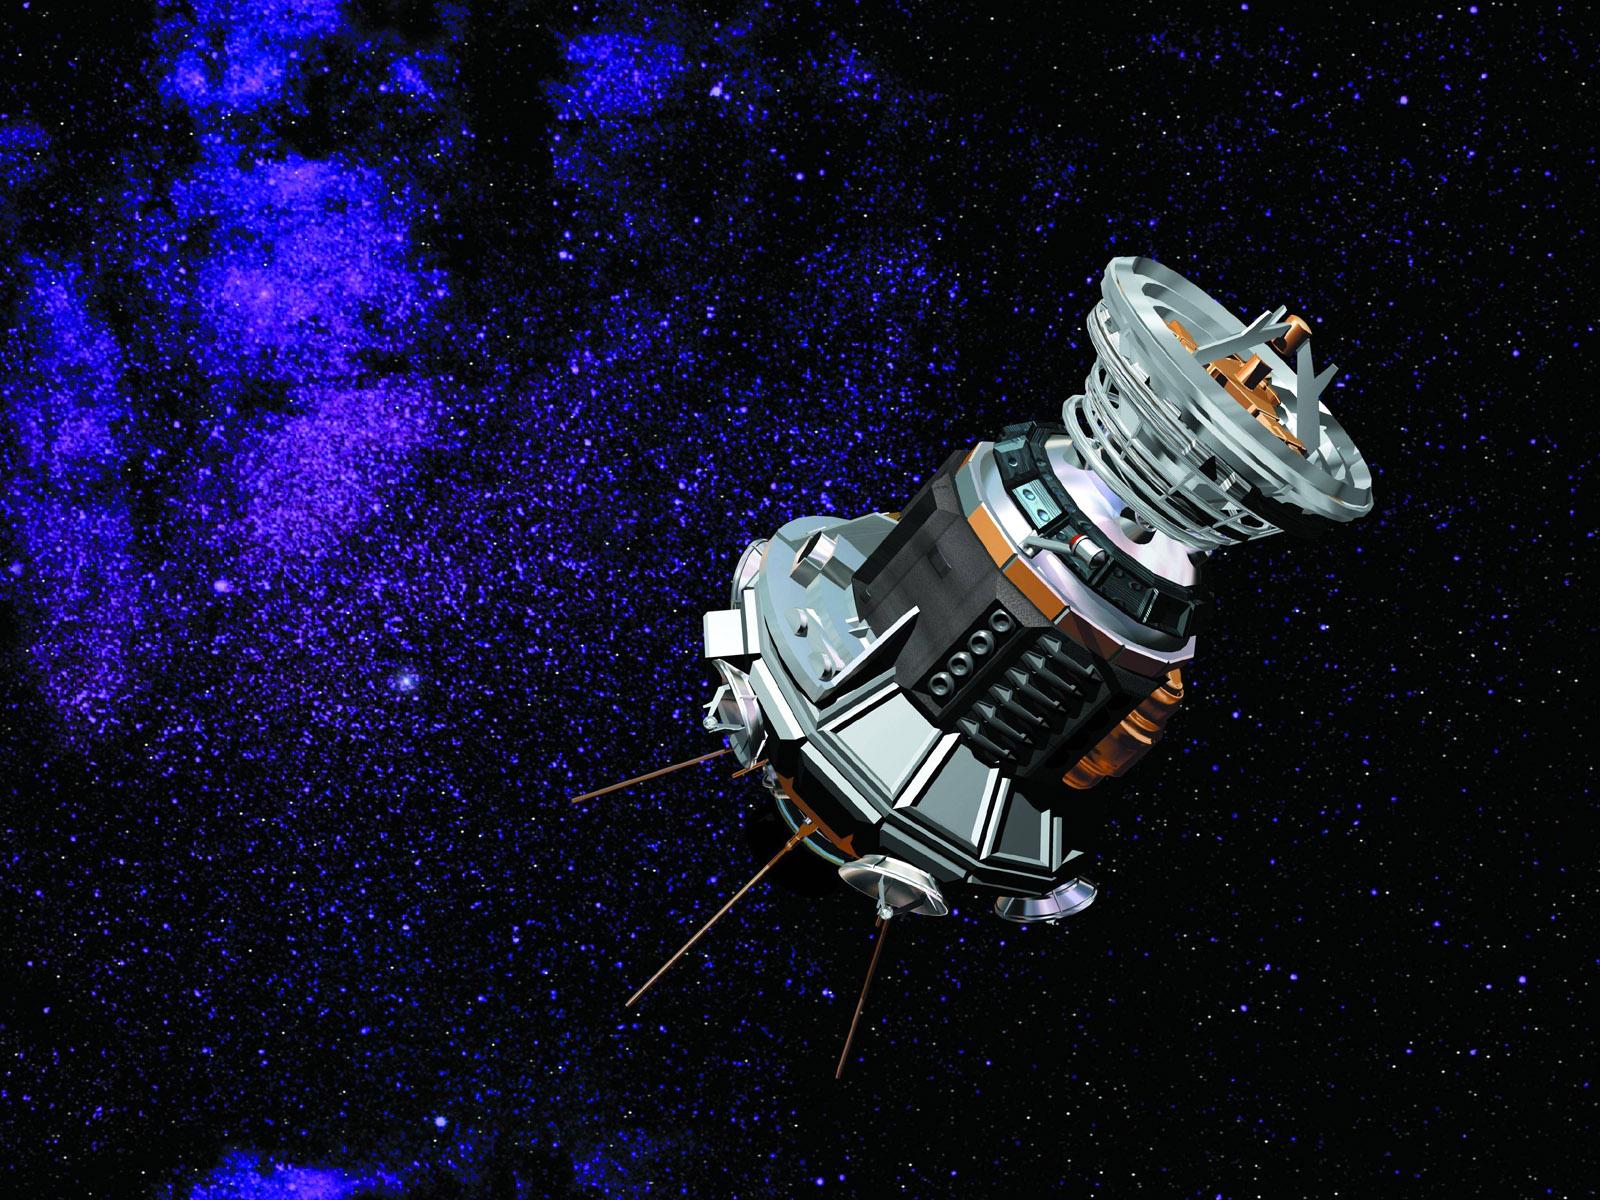 Helga weaver satellite wallpaper hd - Satellite wallpaper hd ...